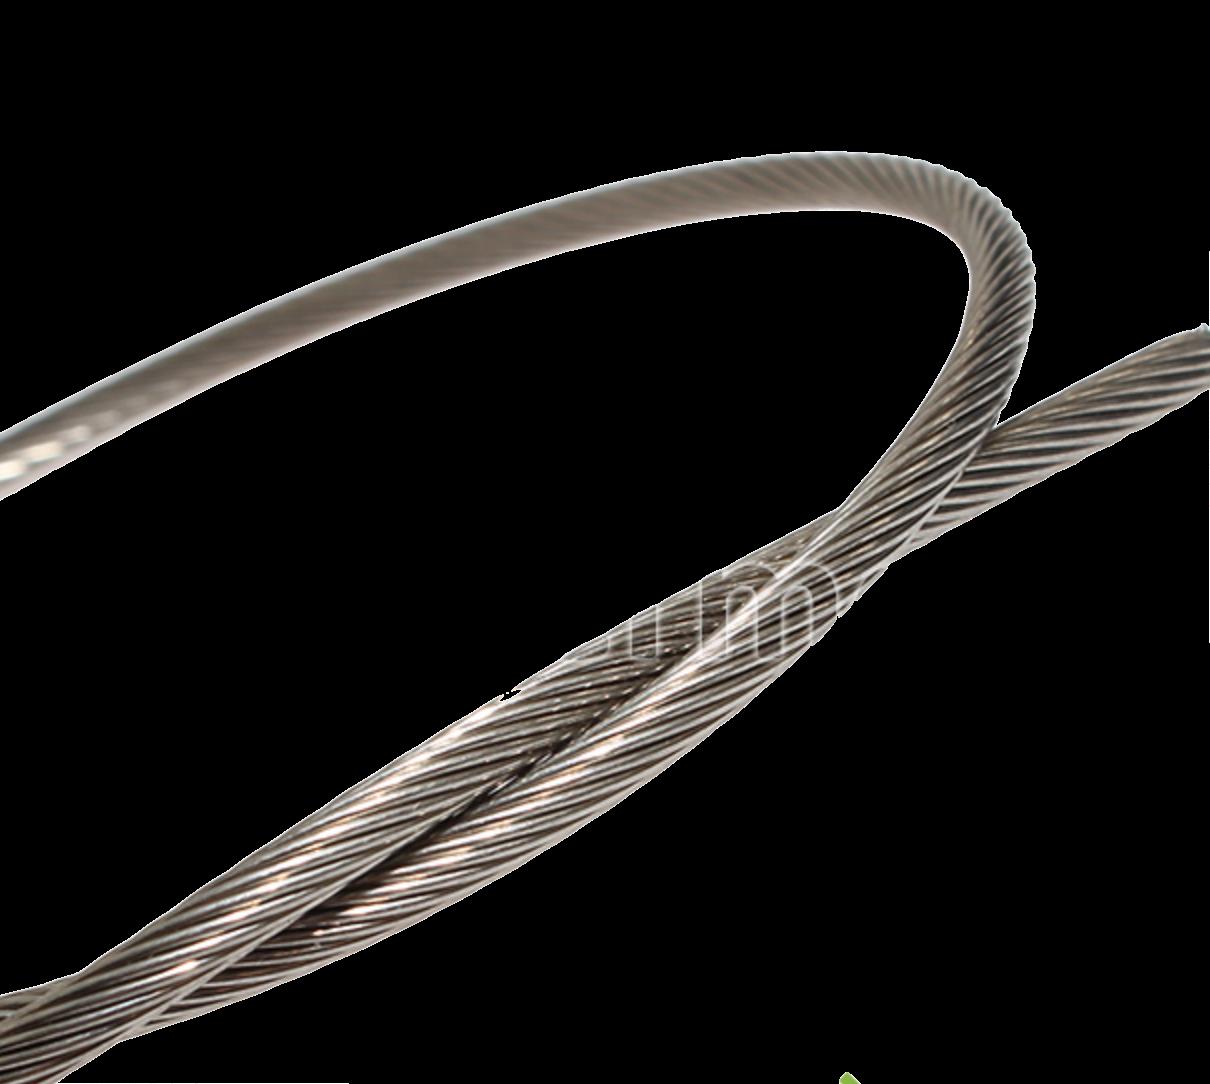 Трос нержавеющий для линий кормления Ø 2 мм